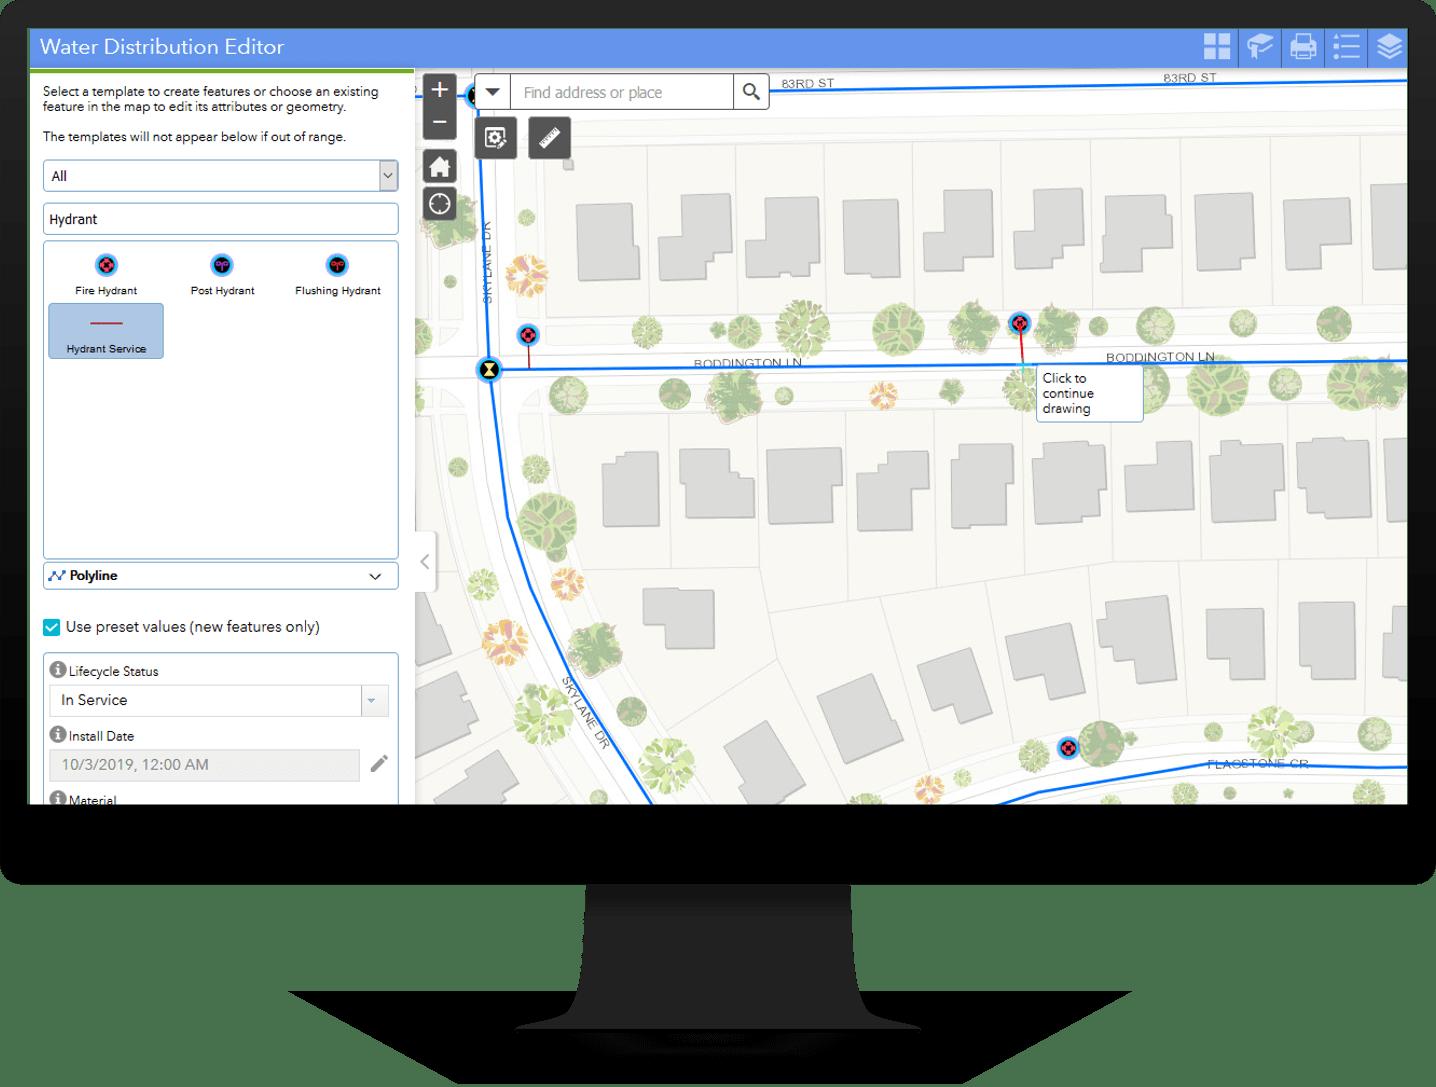 Water Distribution Editor Web App